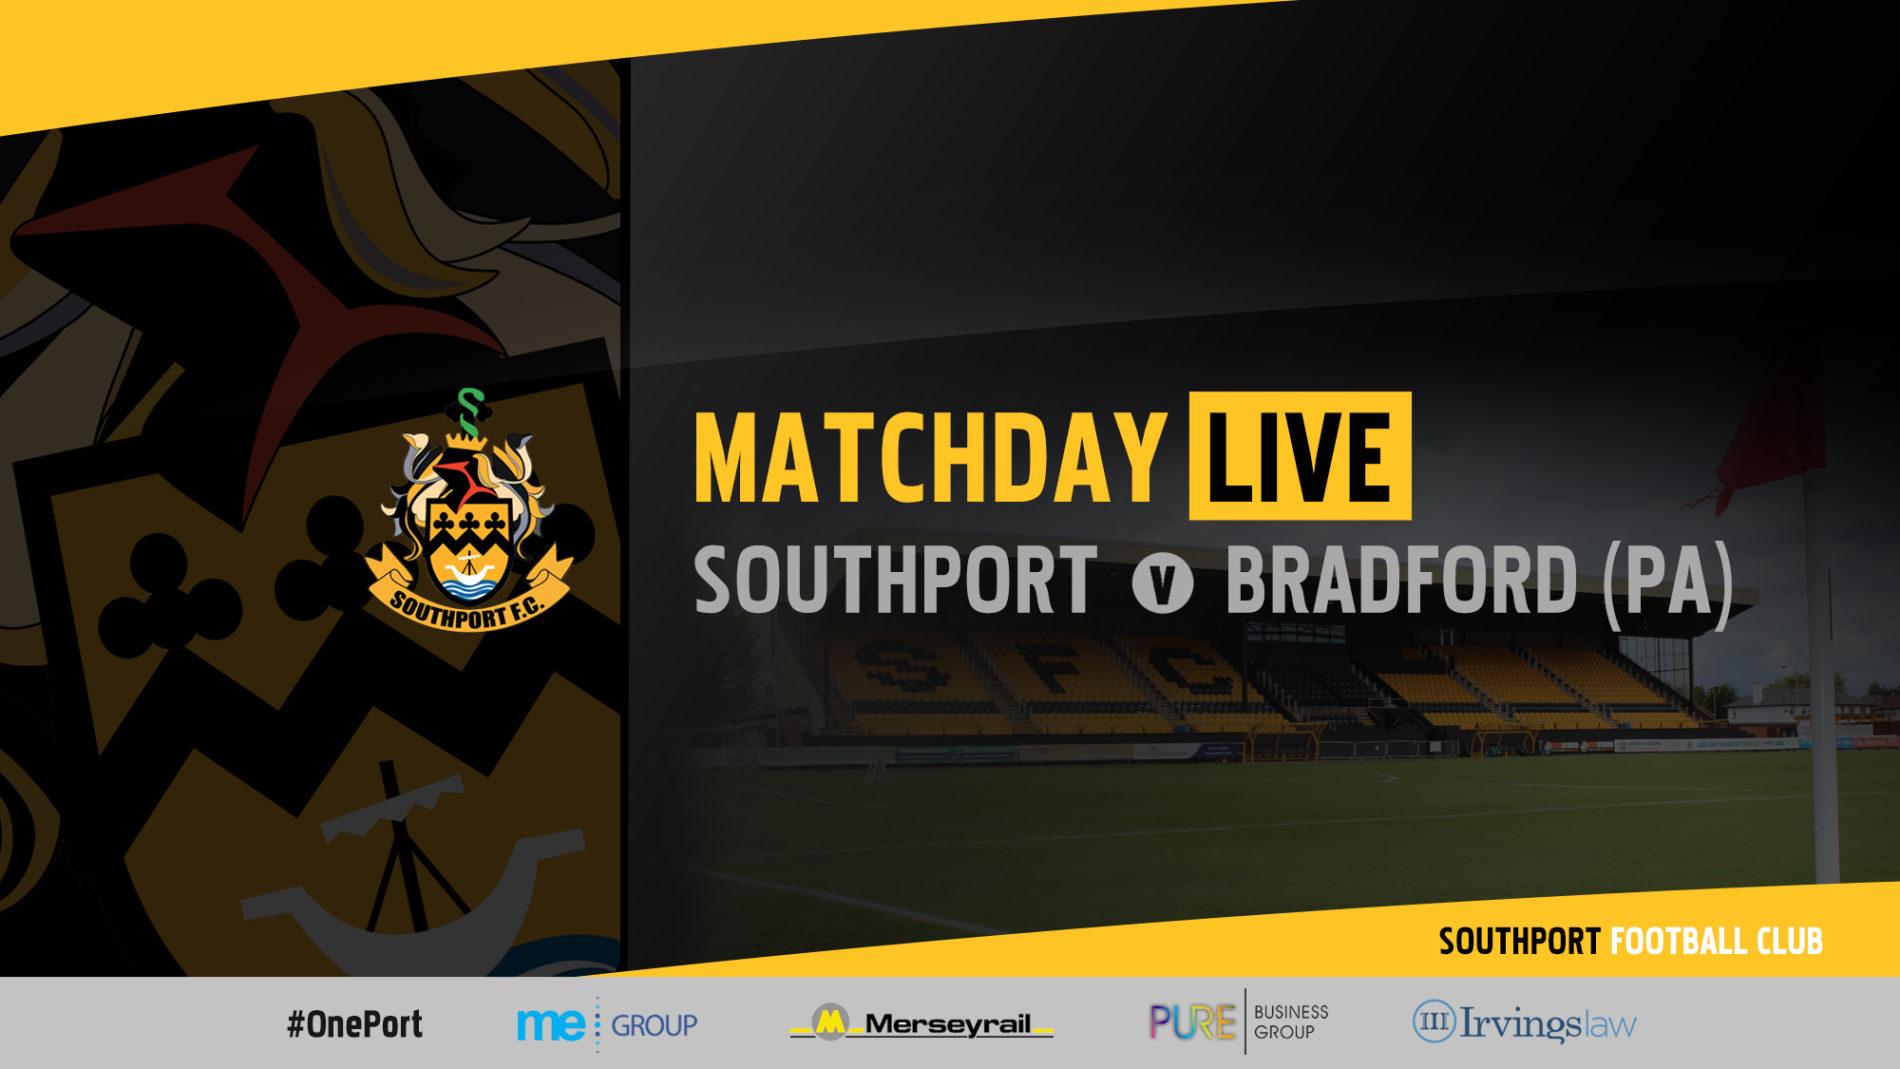 MATCHDAY LIVE | Southport vs Bradford PA